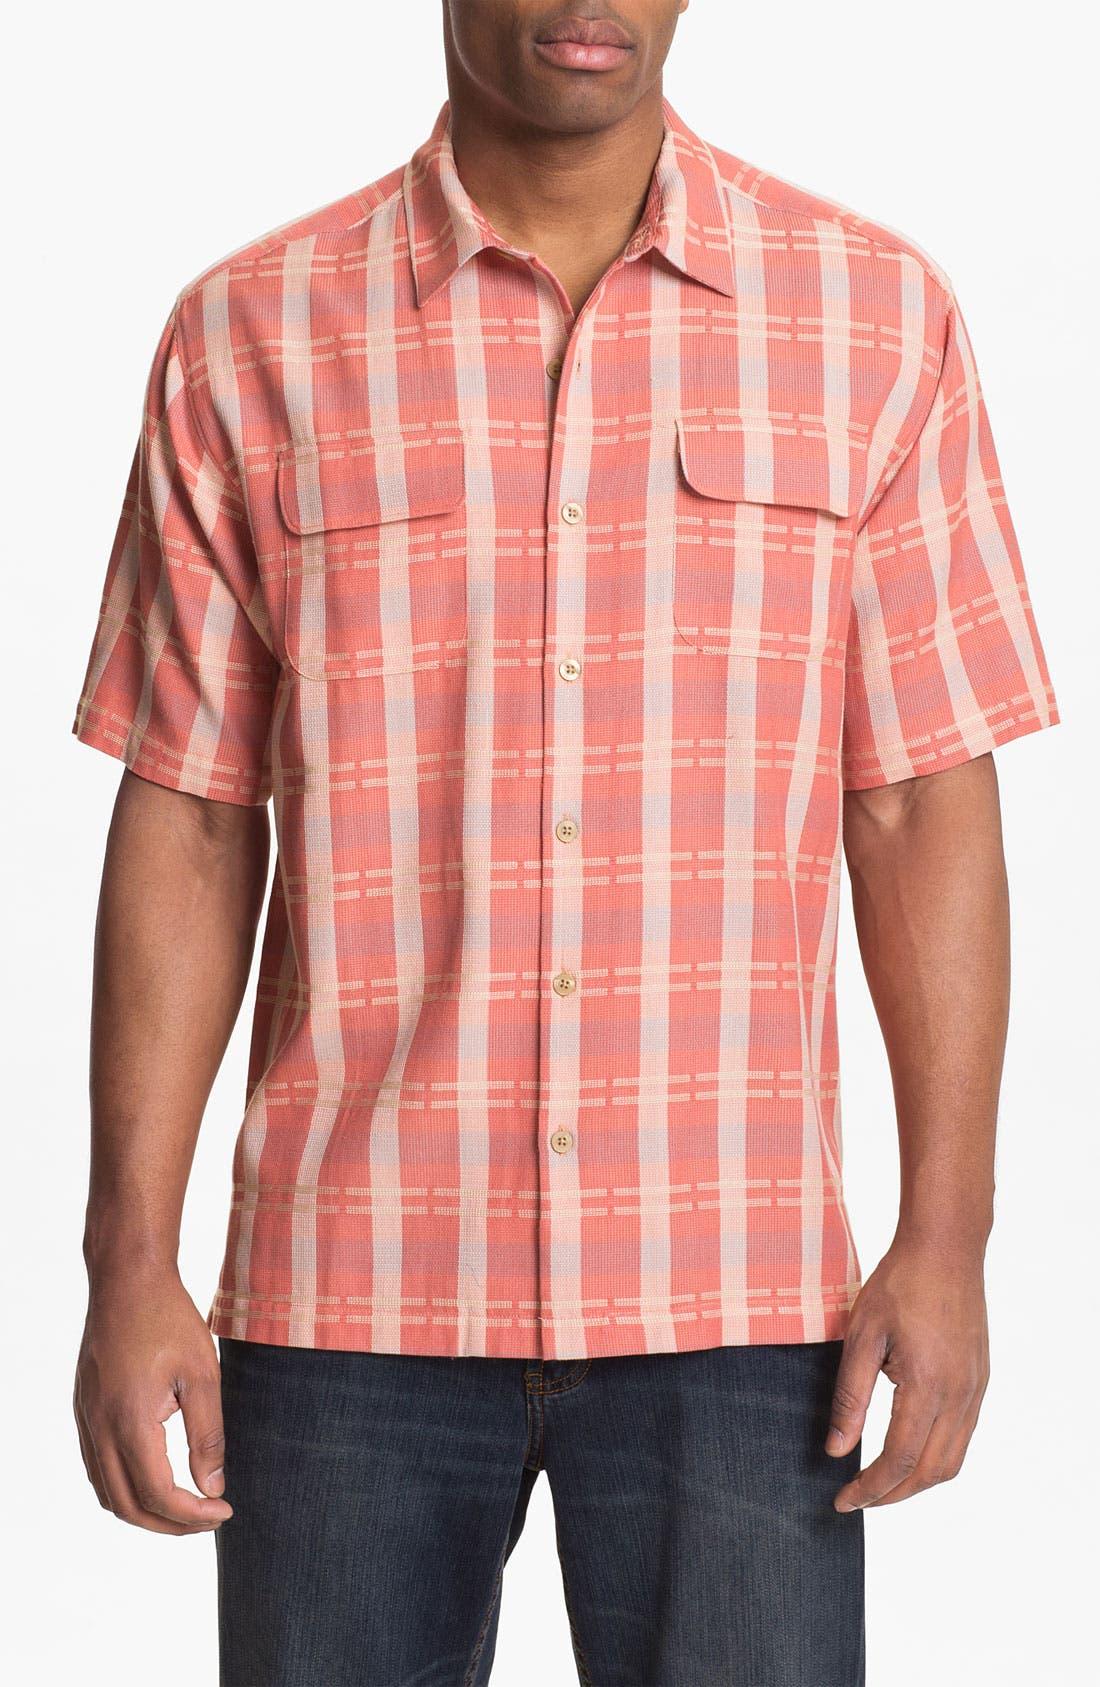 Alternate Image 1 Selected - Tommy Bahama 'Plaid Modern' Silk & Cotton Sport Shirt